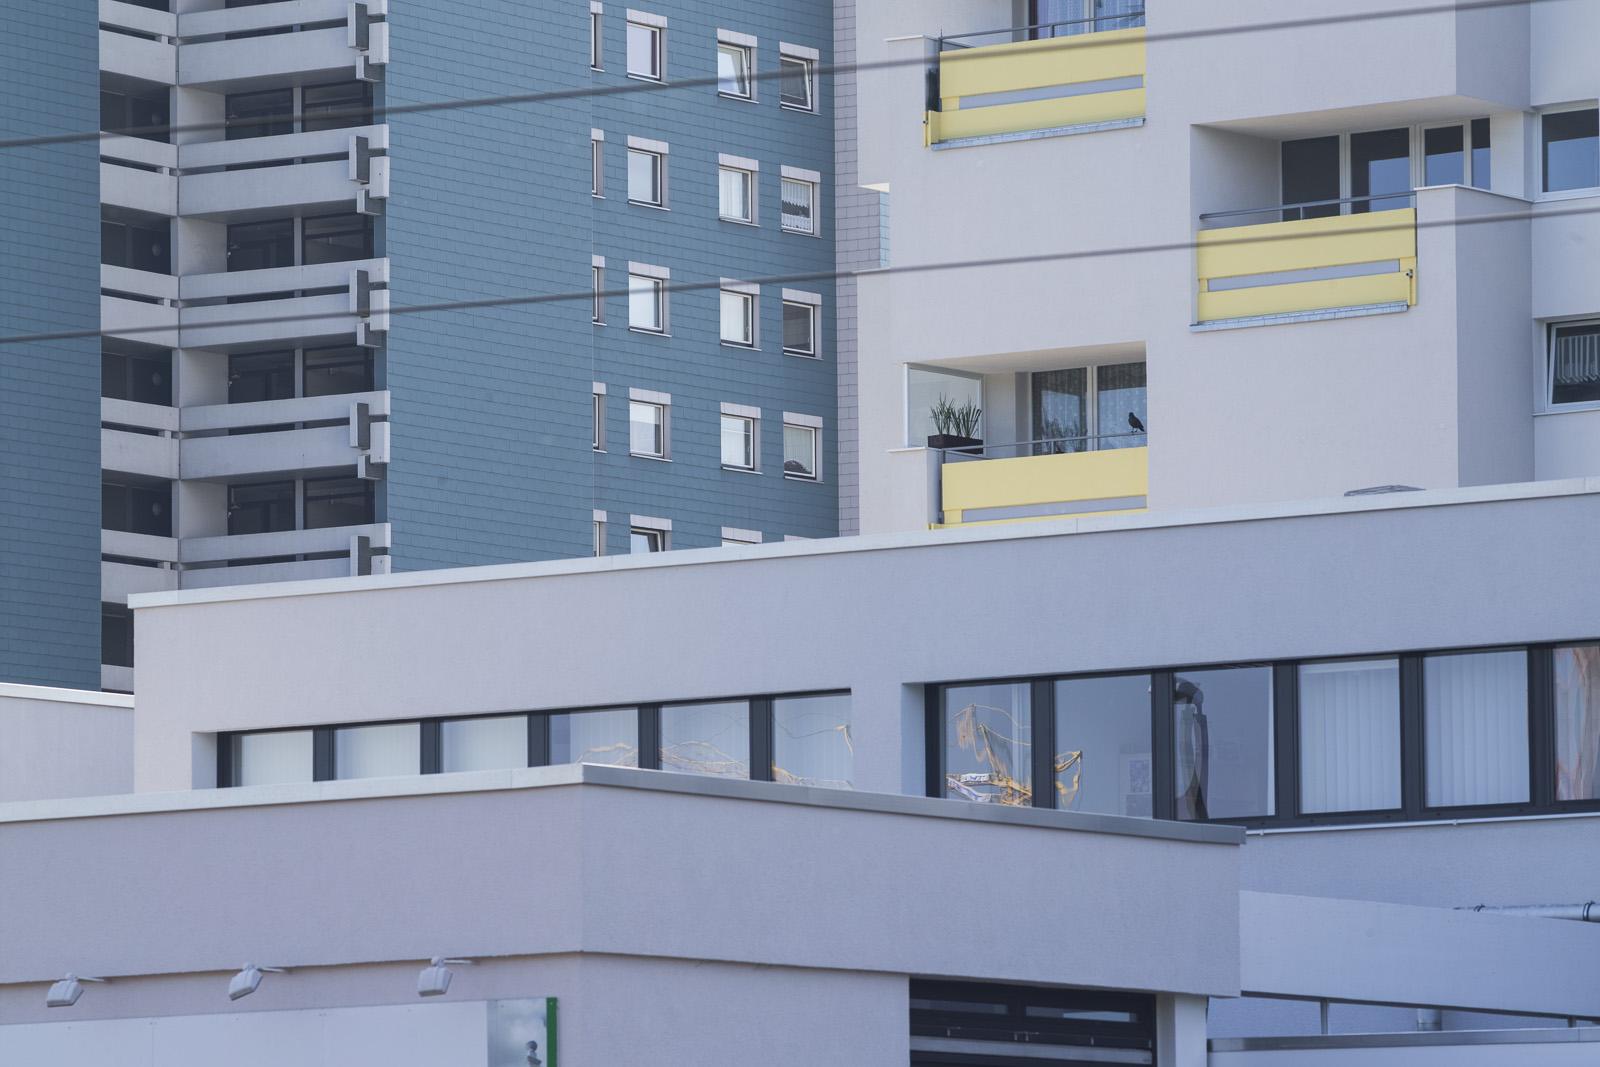 SAKRET Referenz Fassadensanierung WDVS Braunschweig weit weg